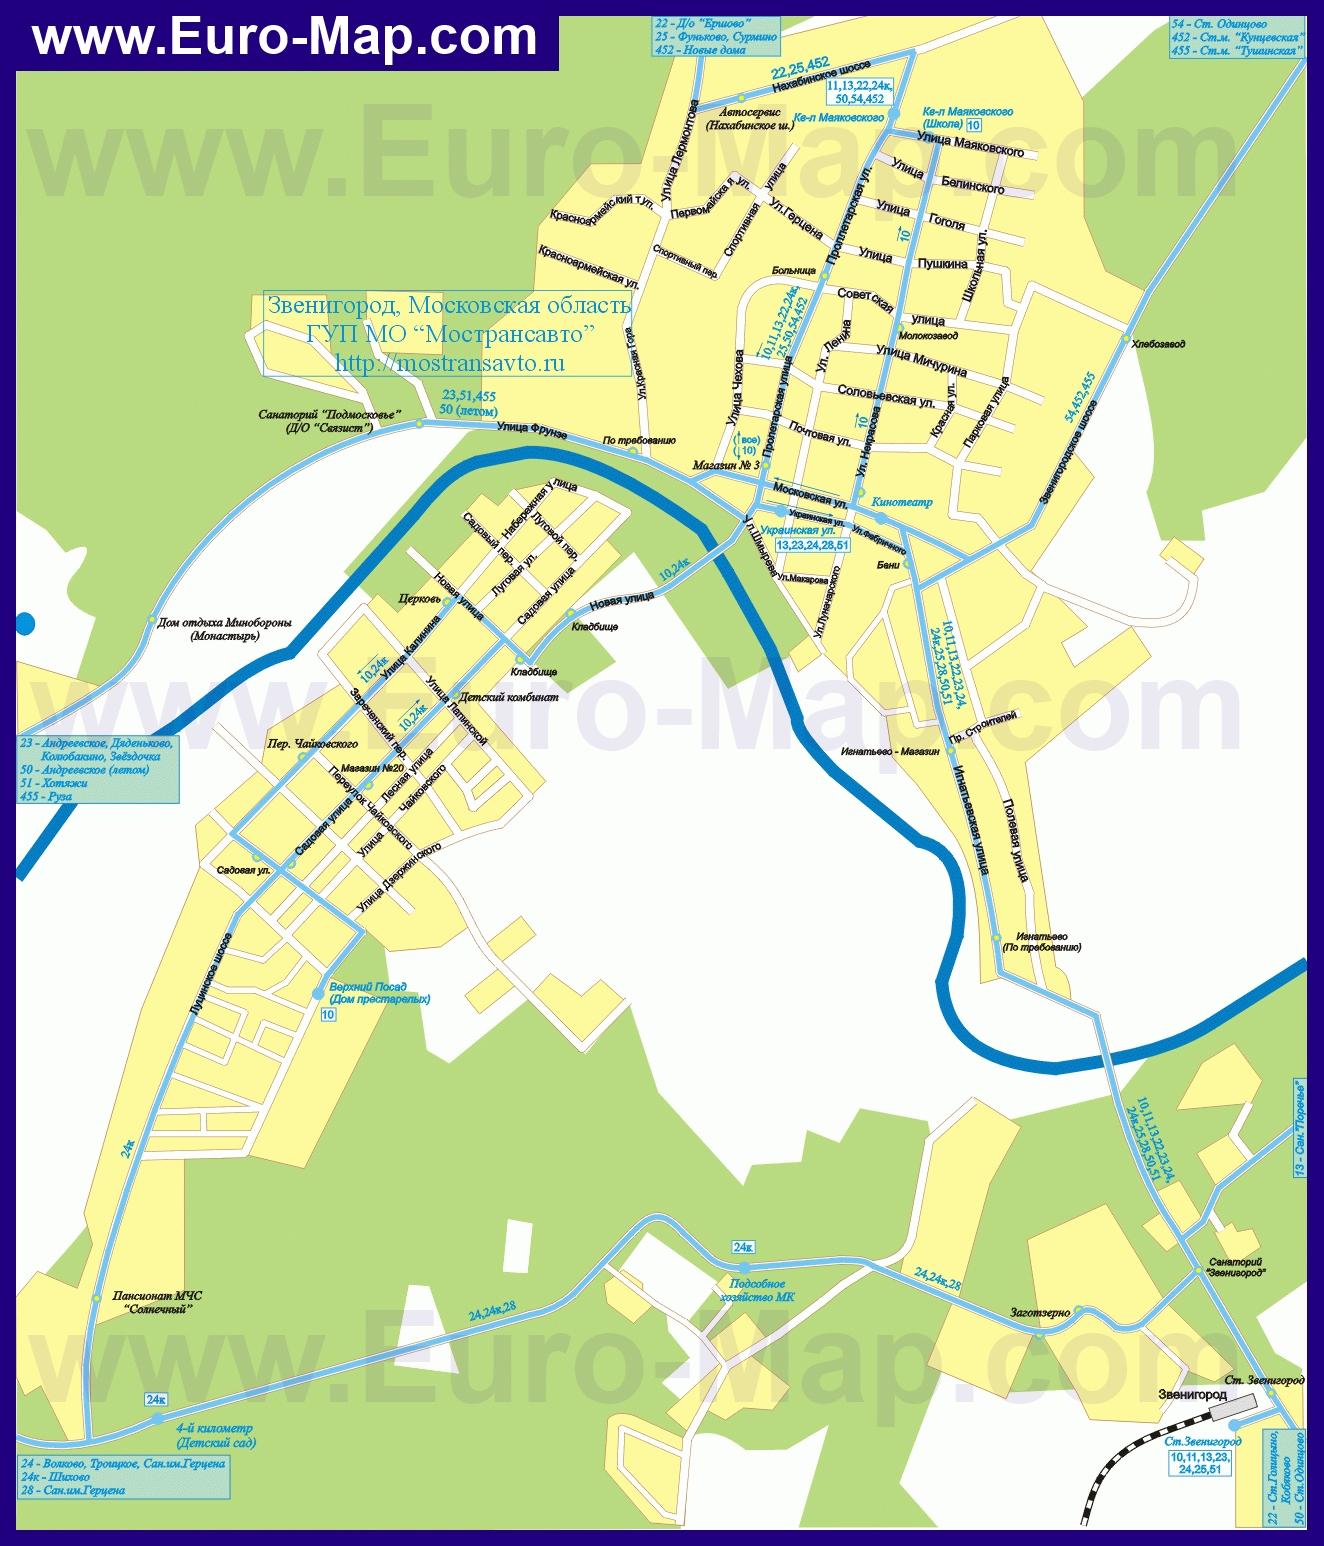 Схема улиц в звенигороде